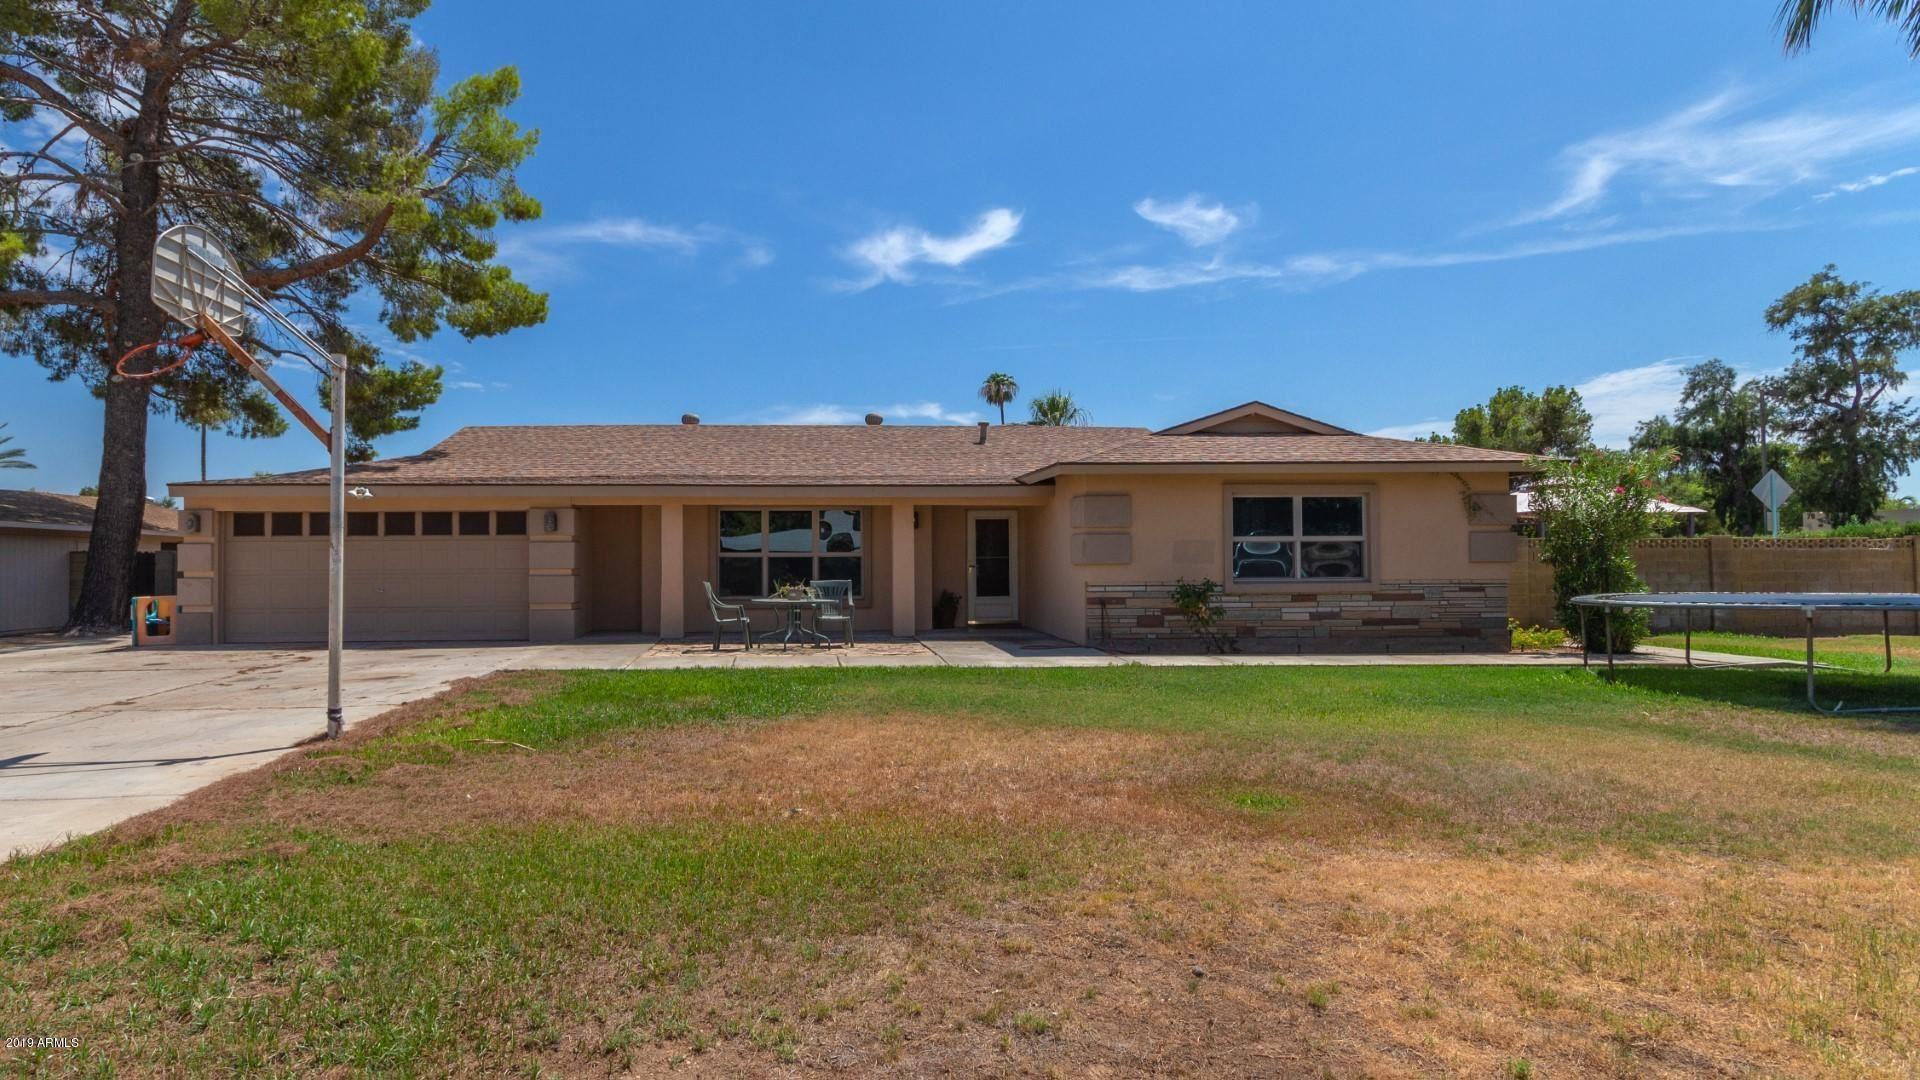 401 E FAIRWAY Drive, Litchfield Park, AZ 85340 - MLS#: 5956603